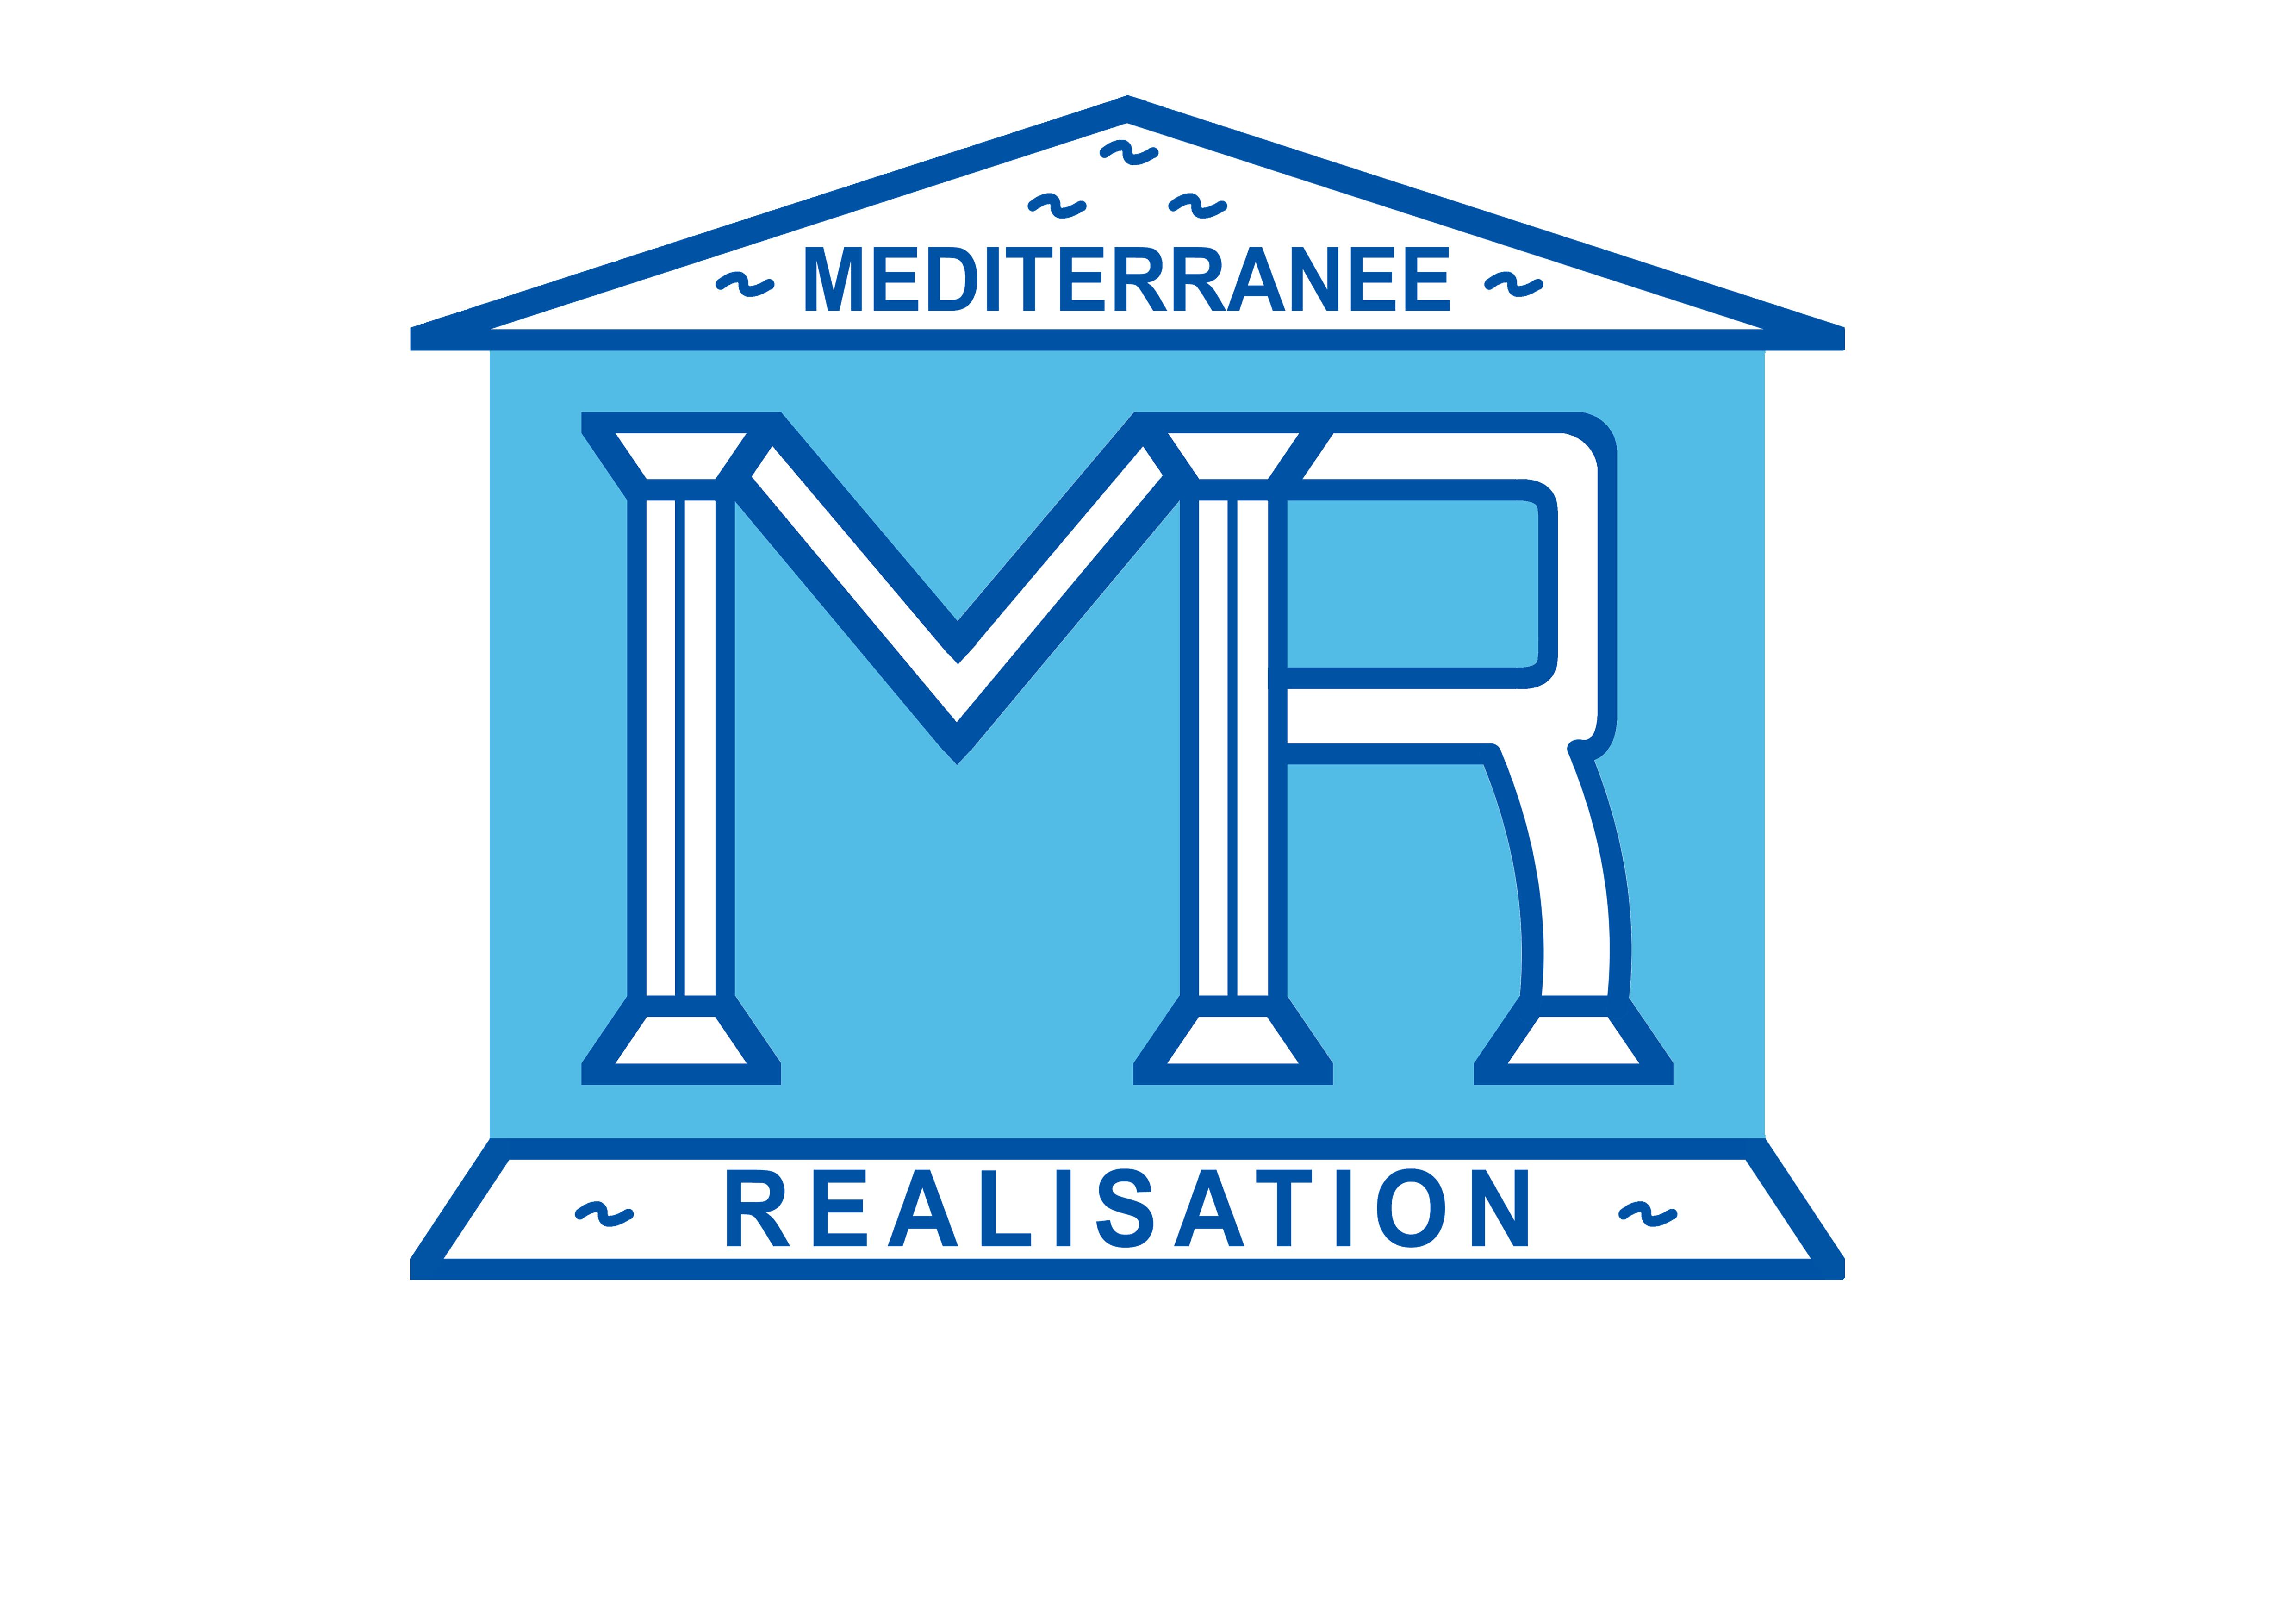 Méditerranée réalisation